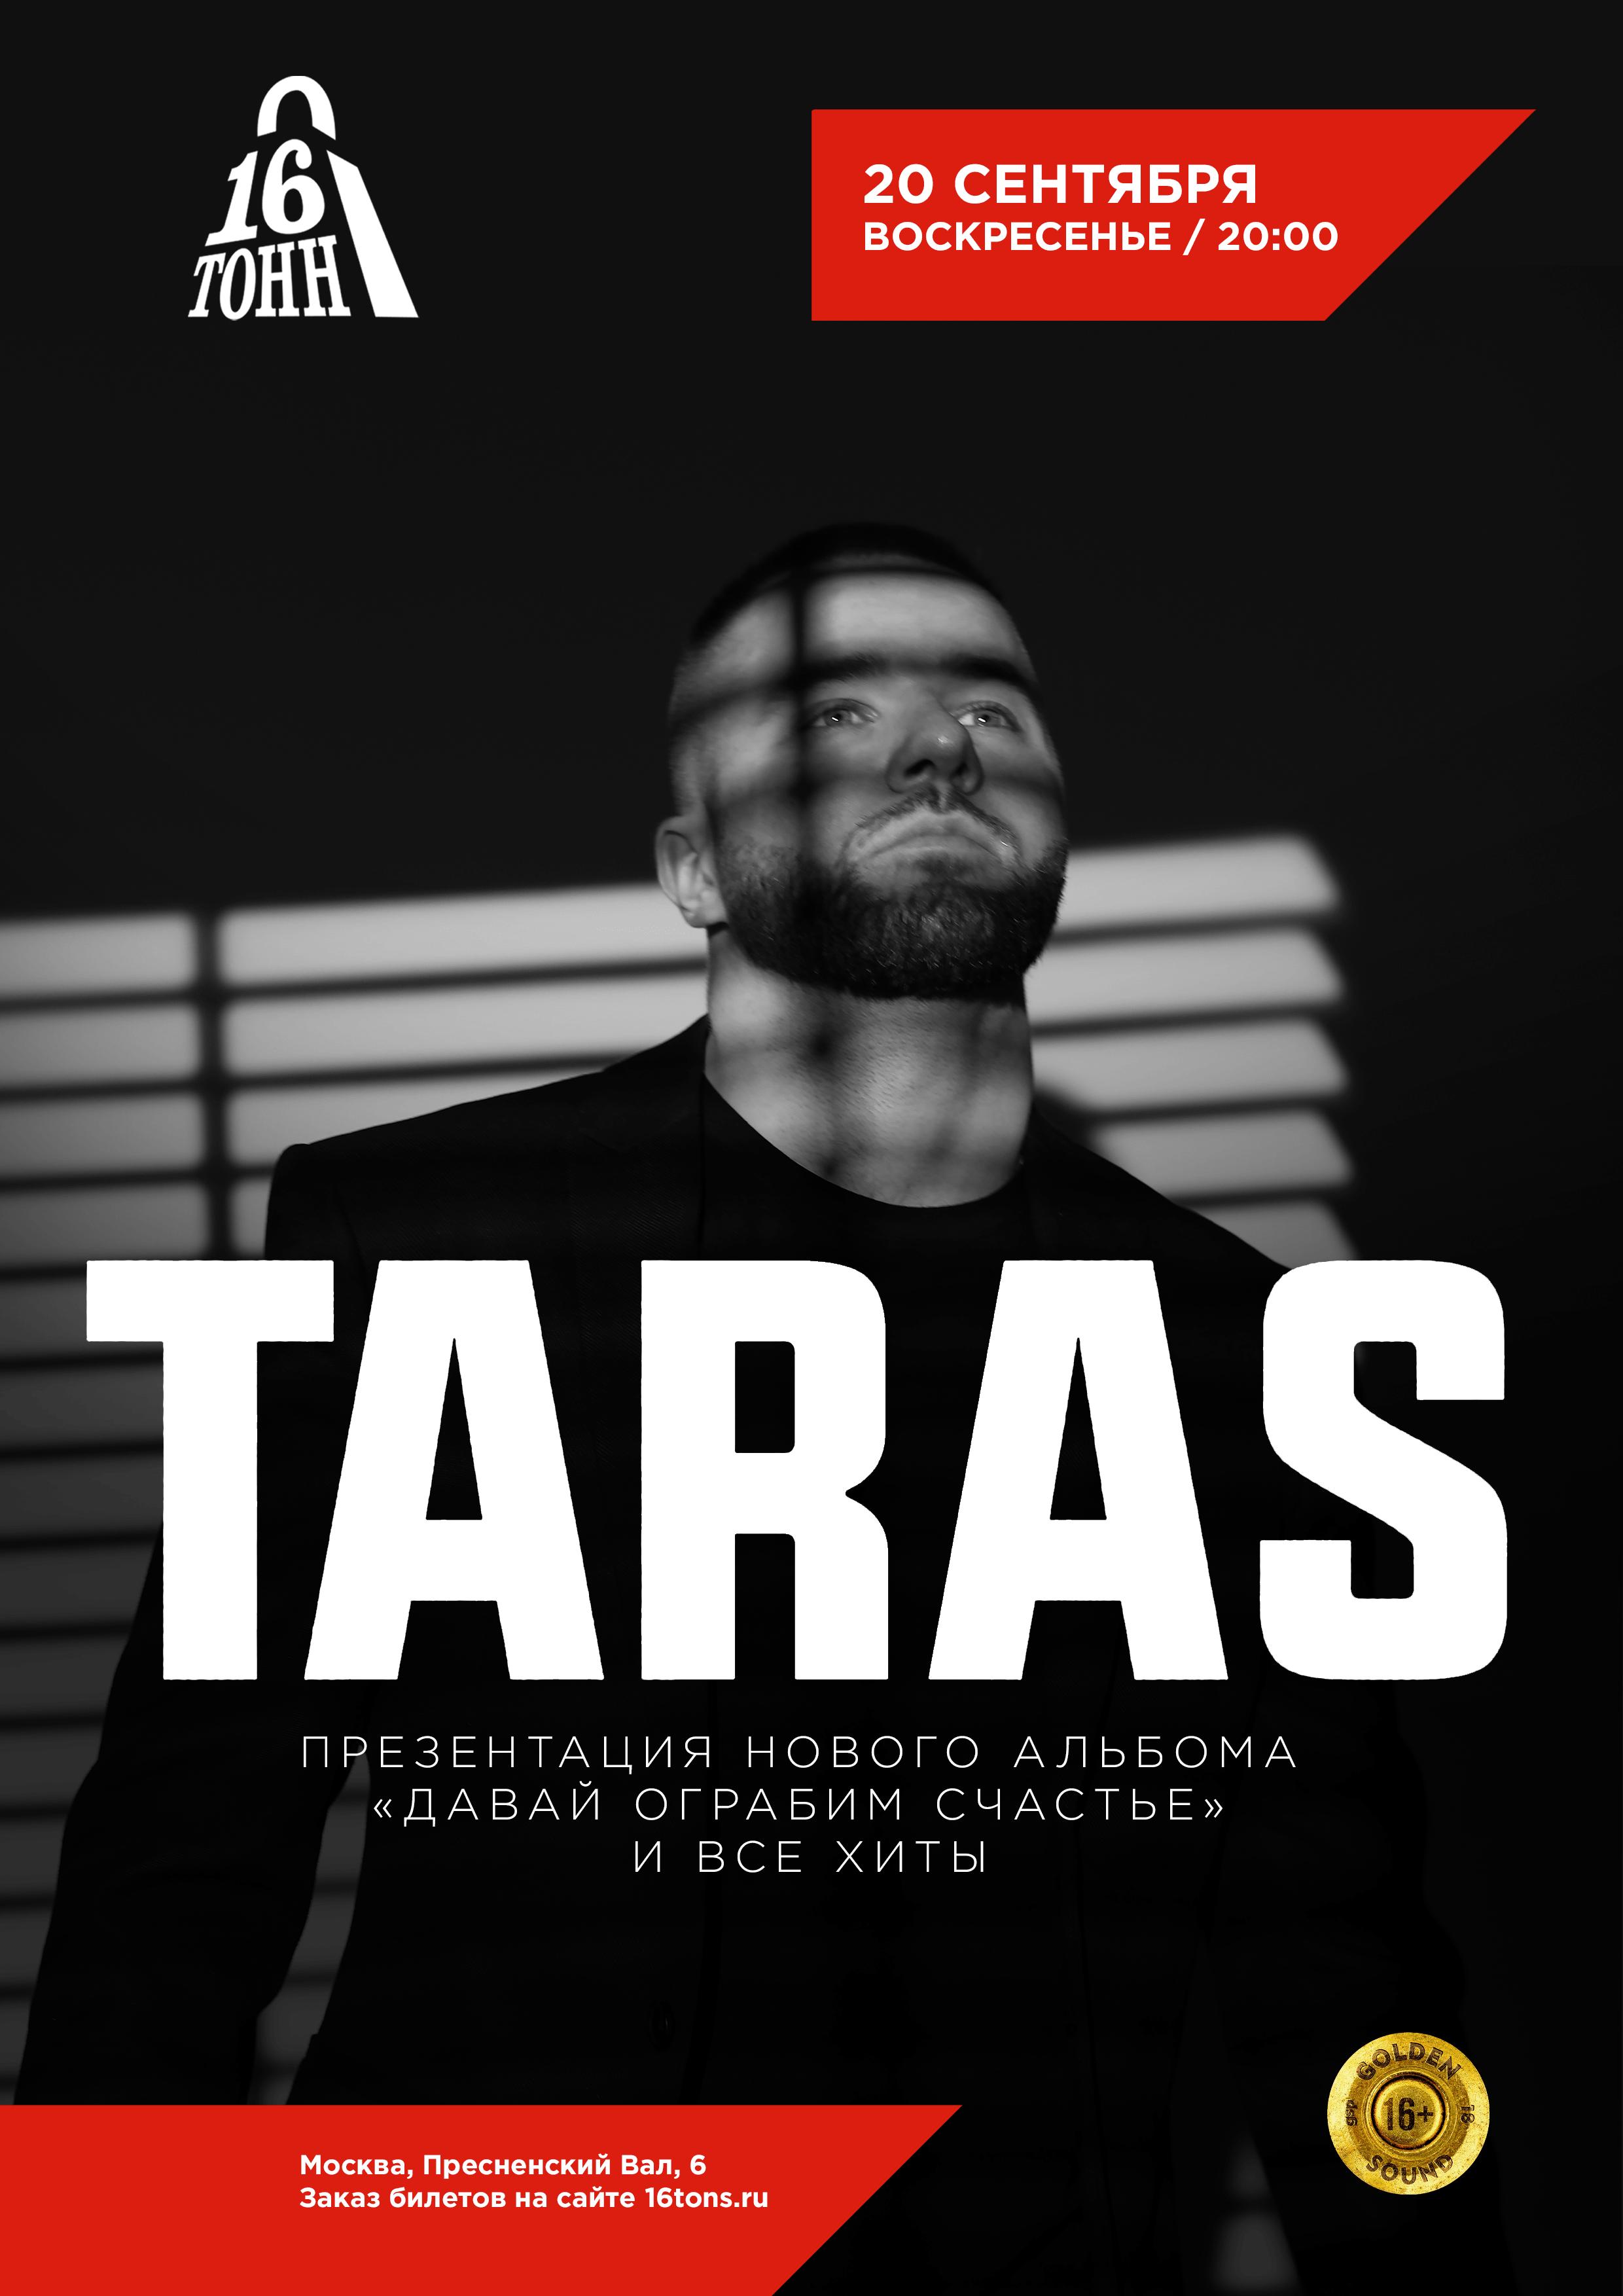 Афиша TARAS